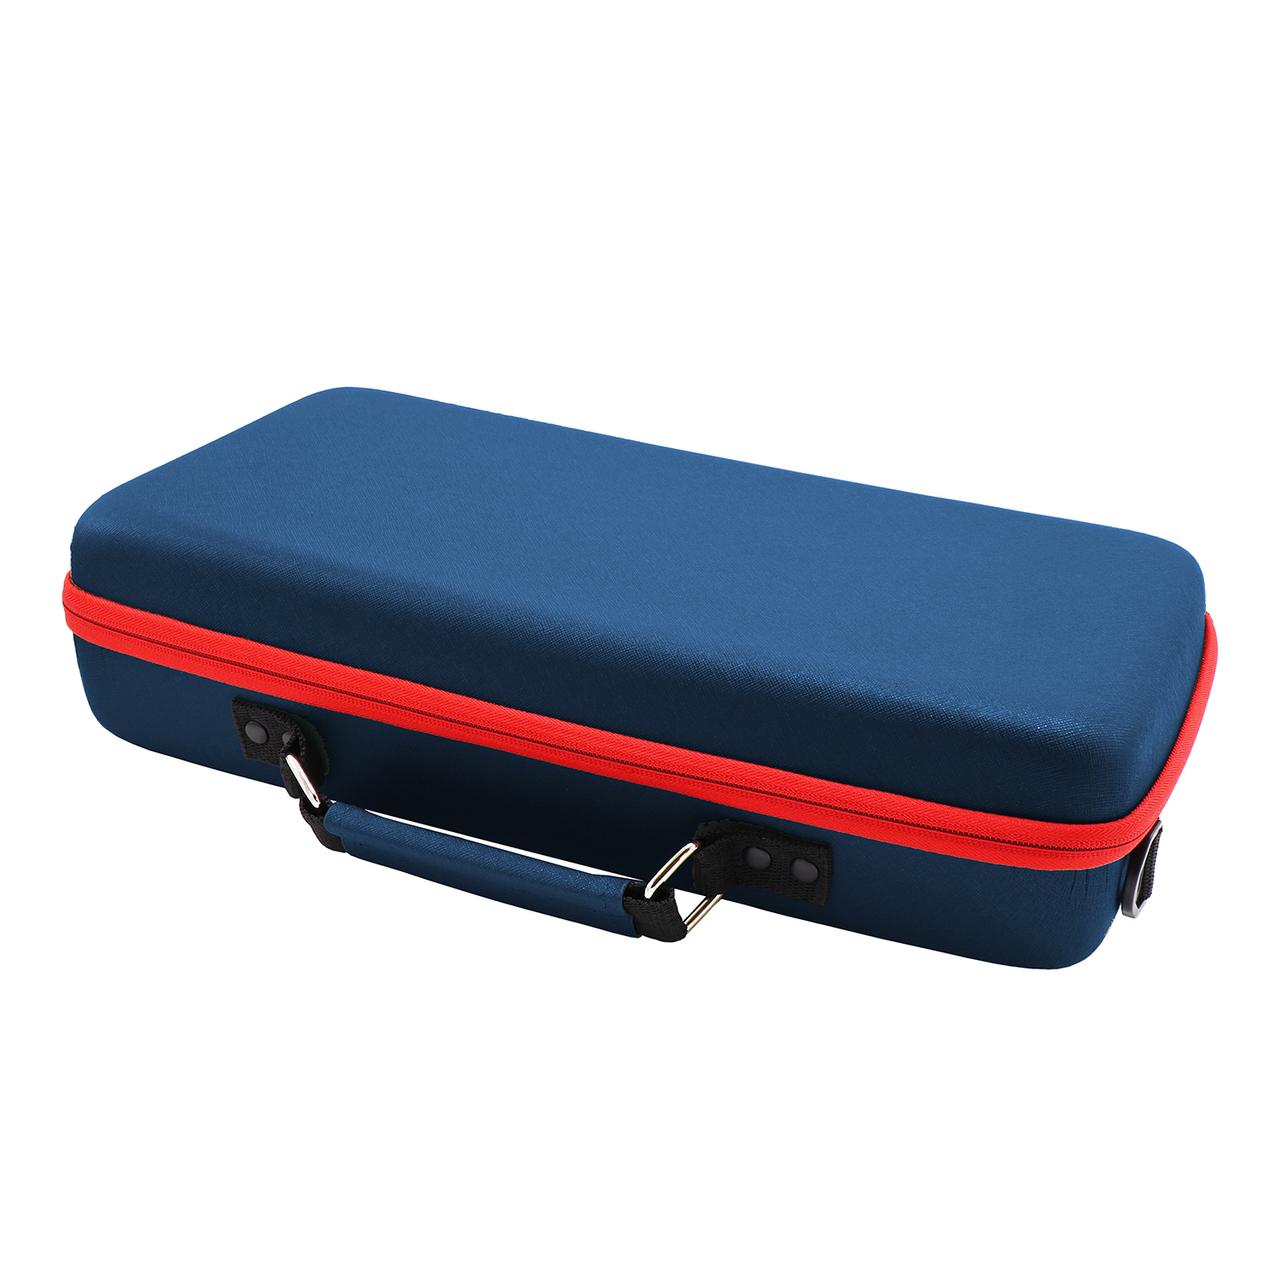 DEX Carrying Case - Blue